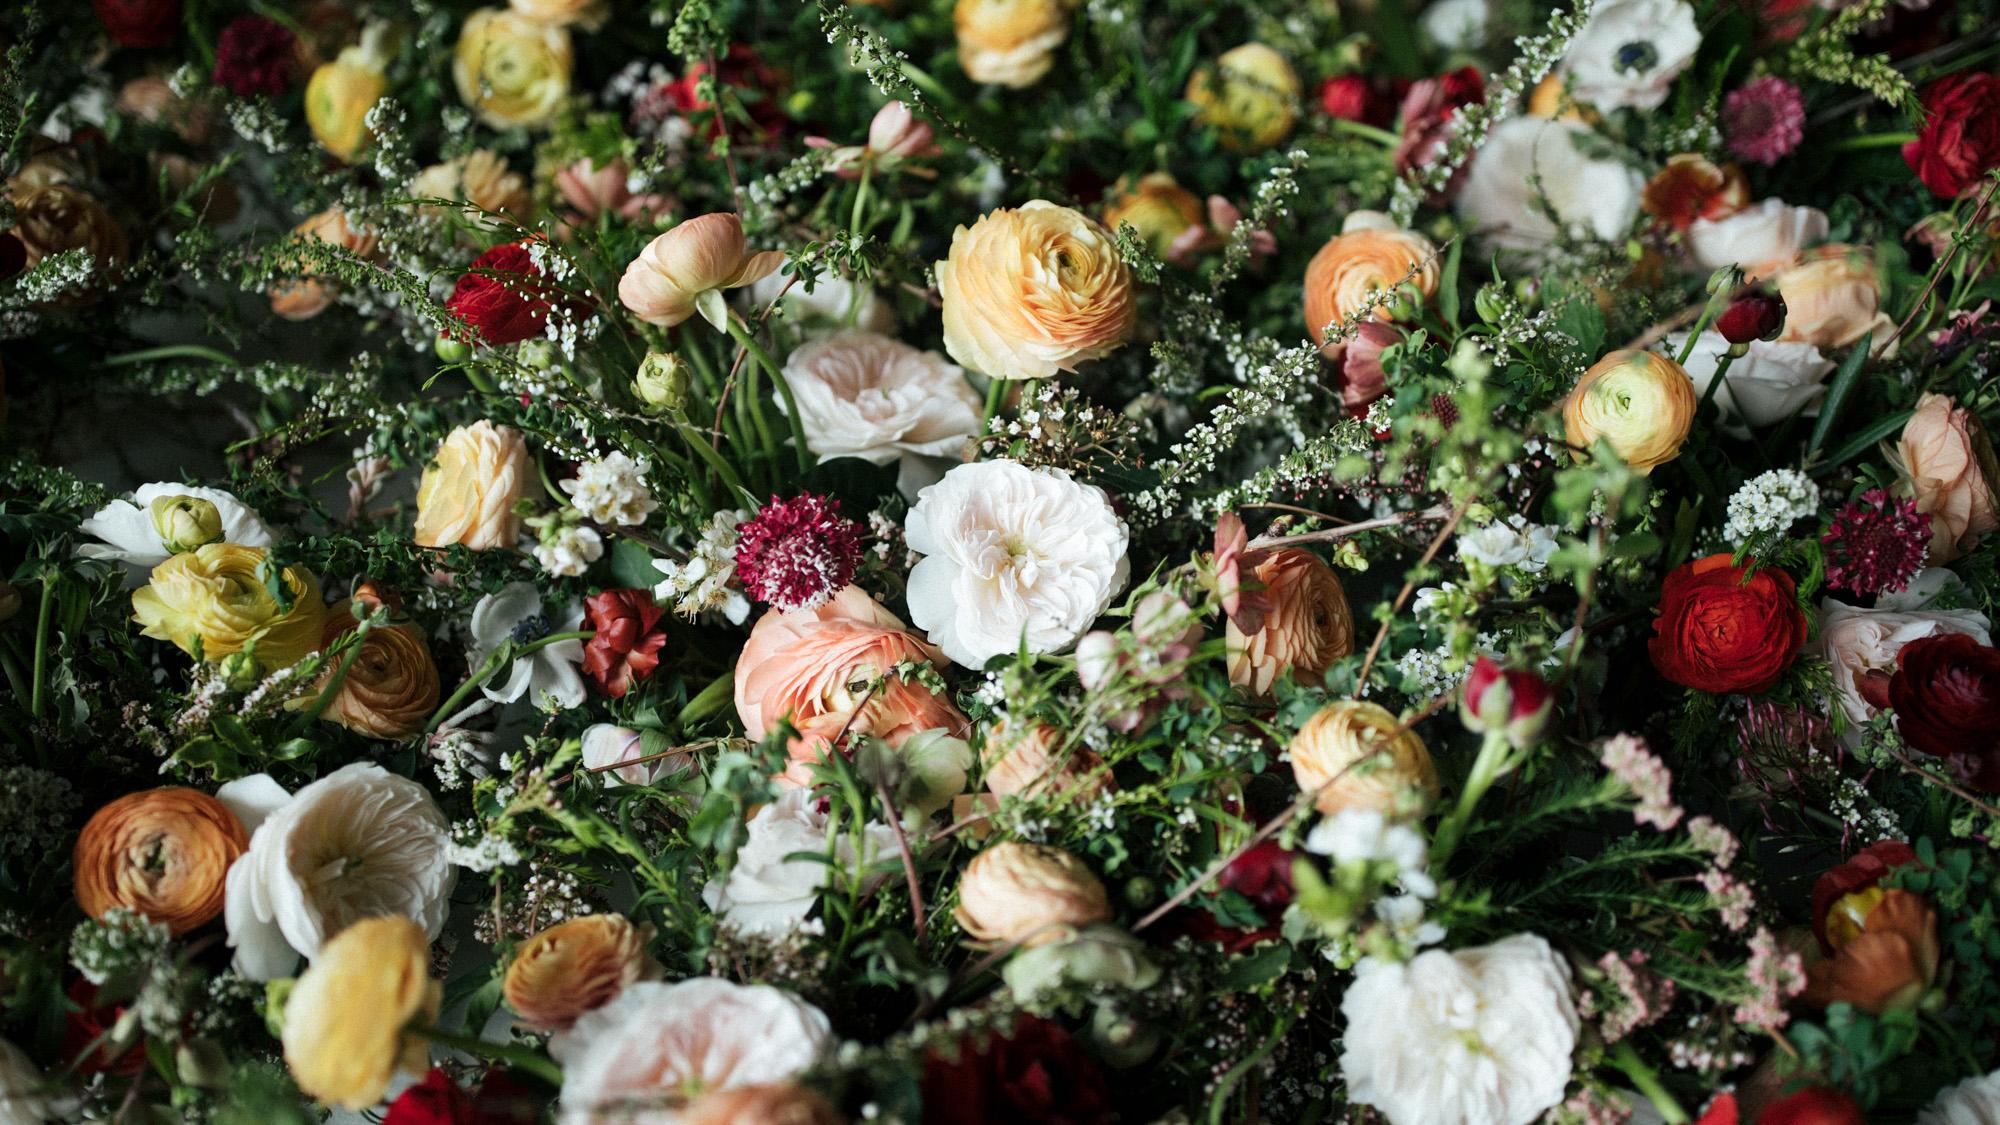 anu_maneesh_alec_vanderboom_Indian_wedding_photography-0174.jpg